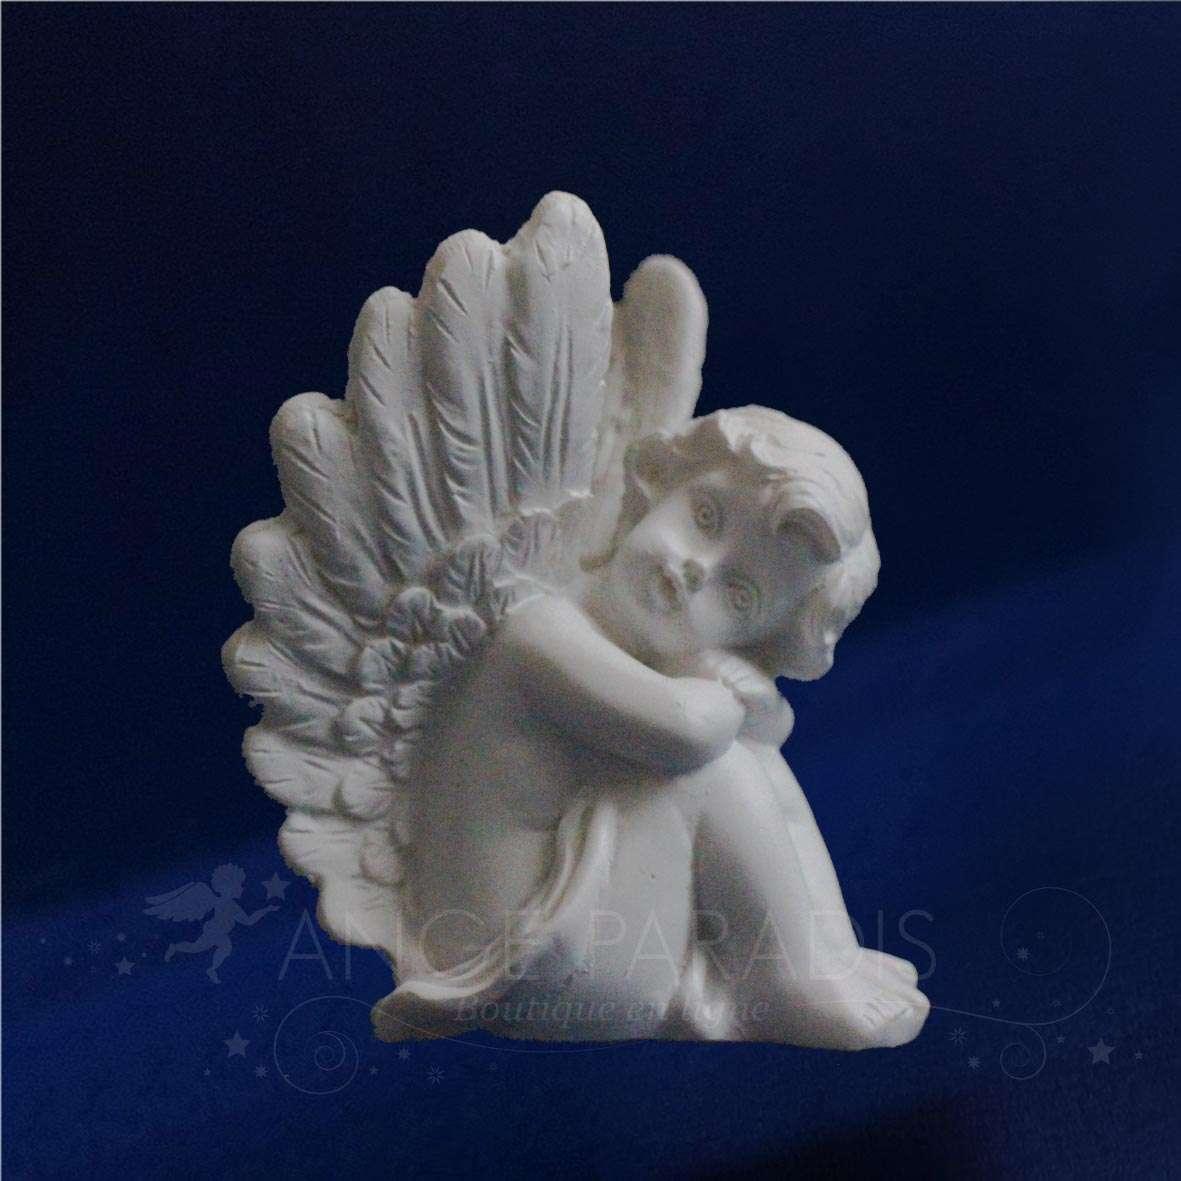 Figura del ángel SOMNOLIENTA